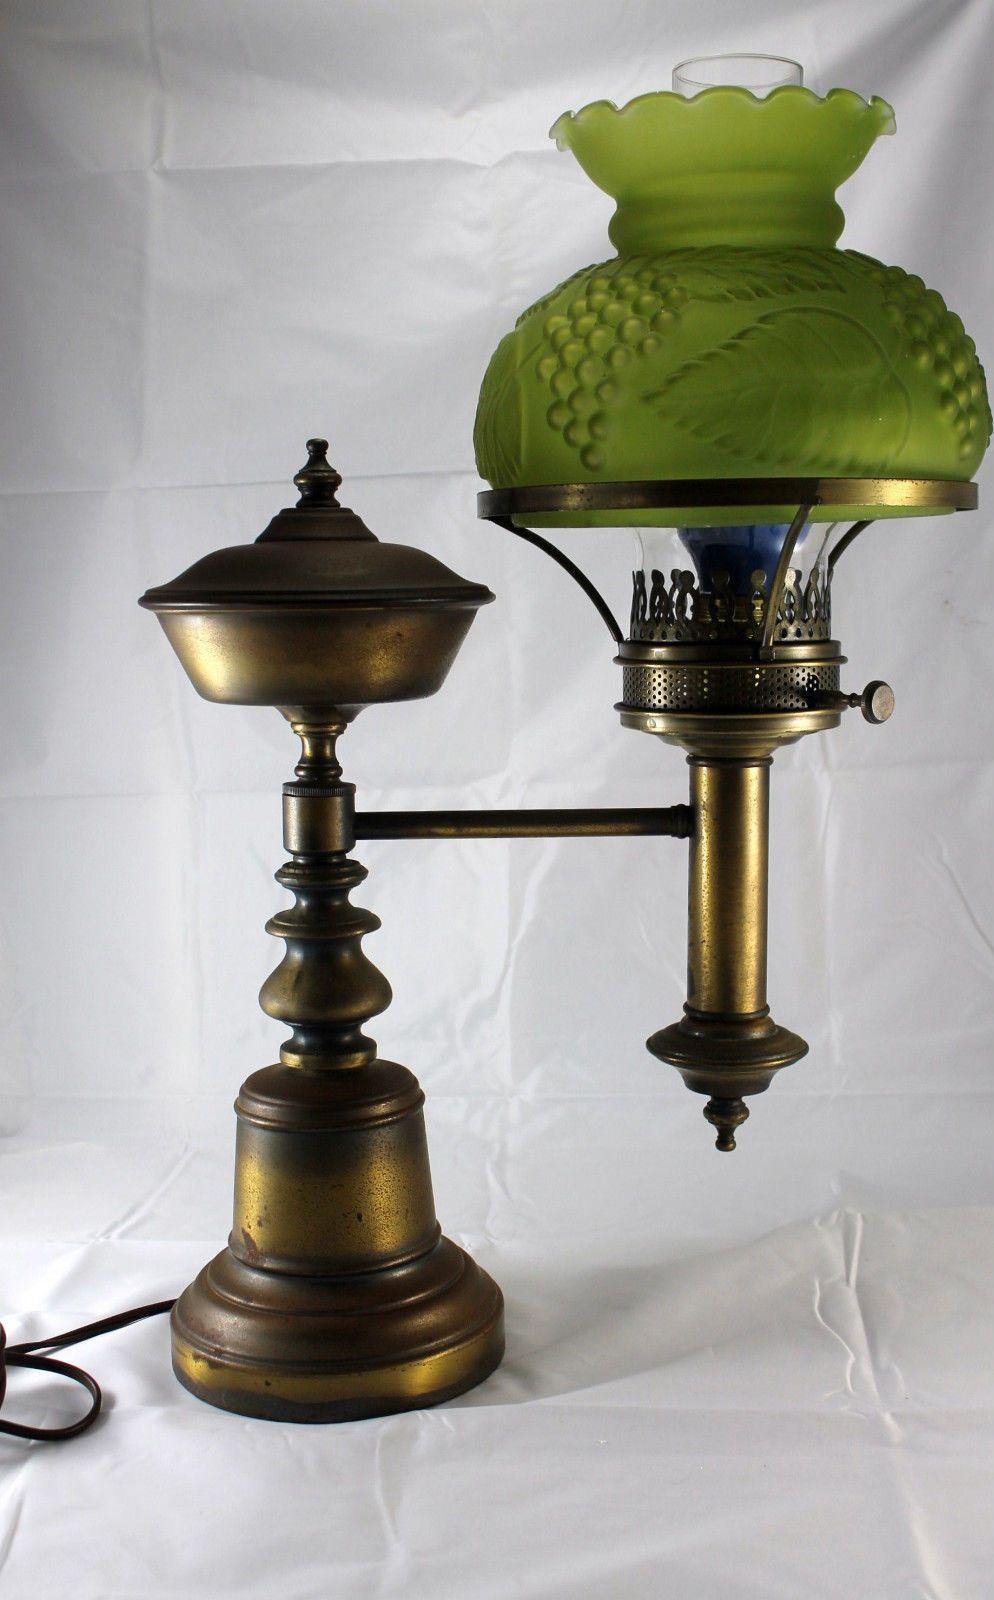 Antique Brass Student Lamp / Original Oil Kerosene Lamp